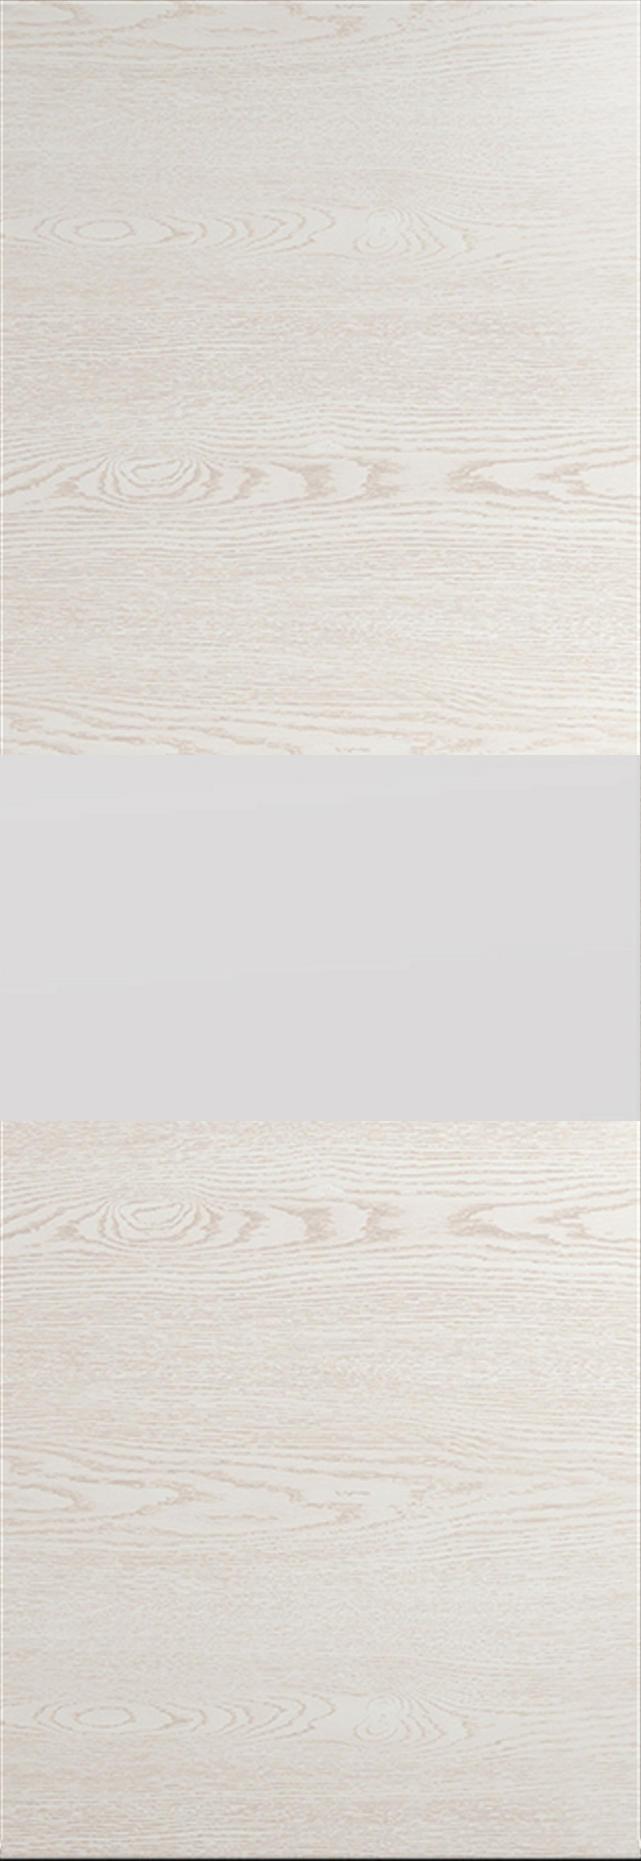 Tivoli Е-4 Invisible цвет - Белый ясень Без стекла (ДГ)